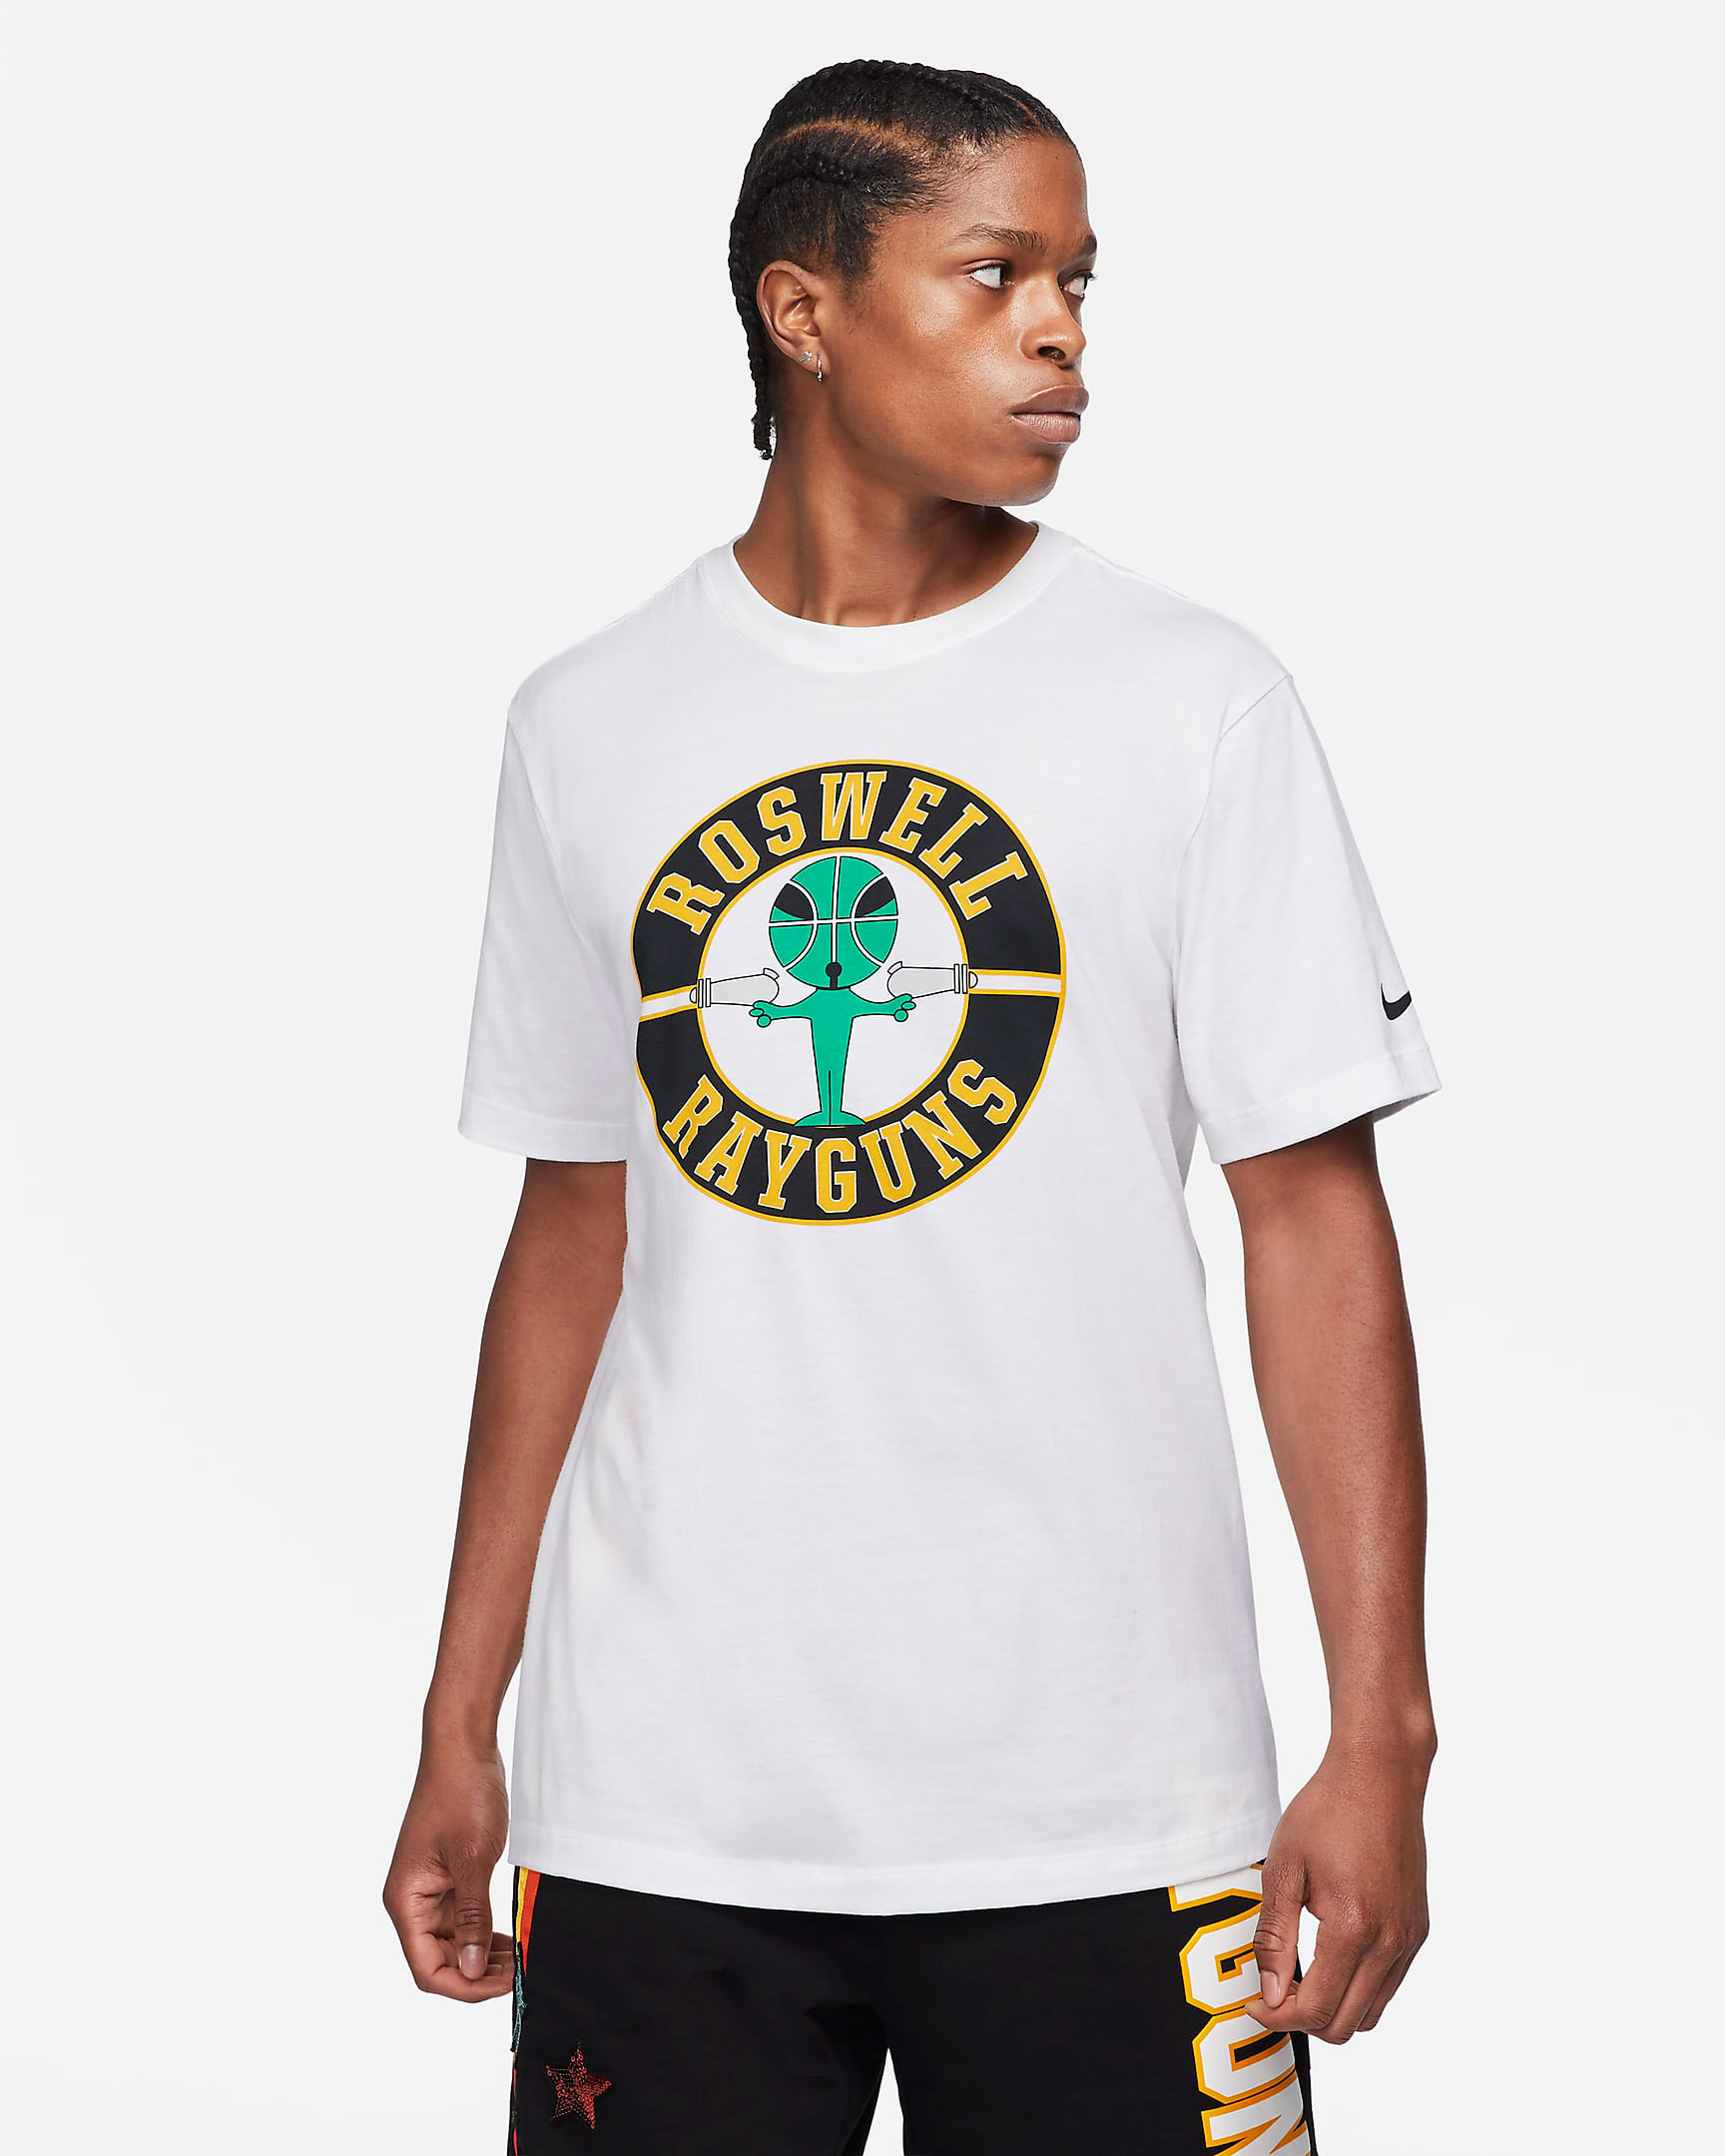 nike-roswell-rayguns-white-t-shirt